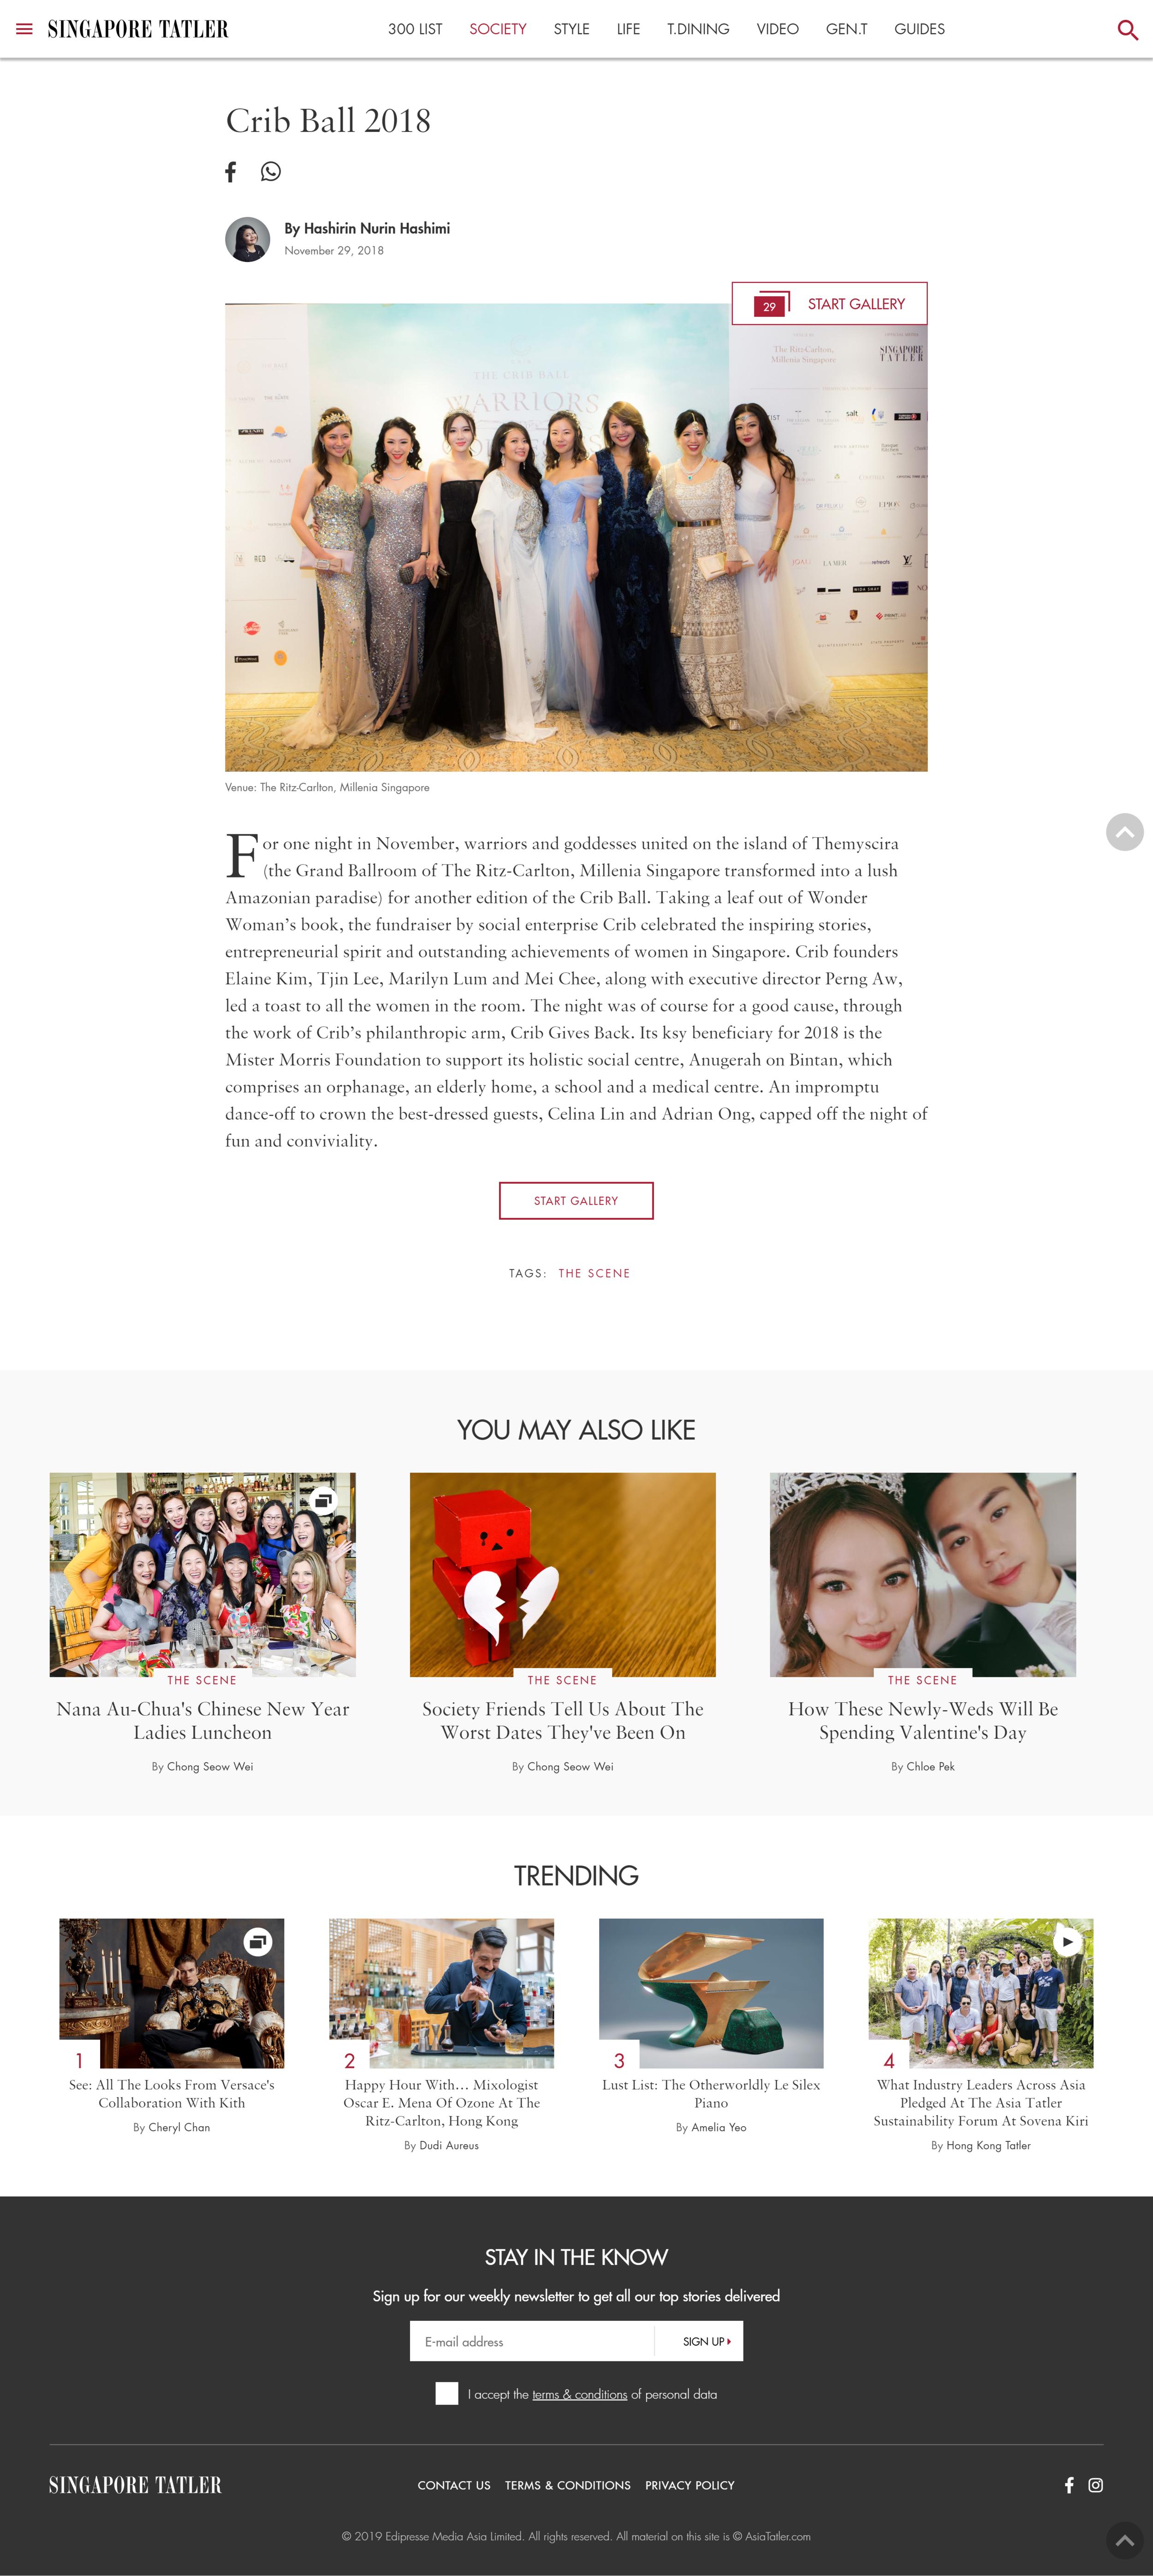 screencapture-sg-asiatatler-events-crib-ball-2018-2019-02-14-21_25_20.png